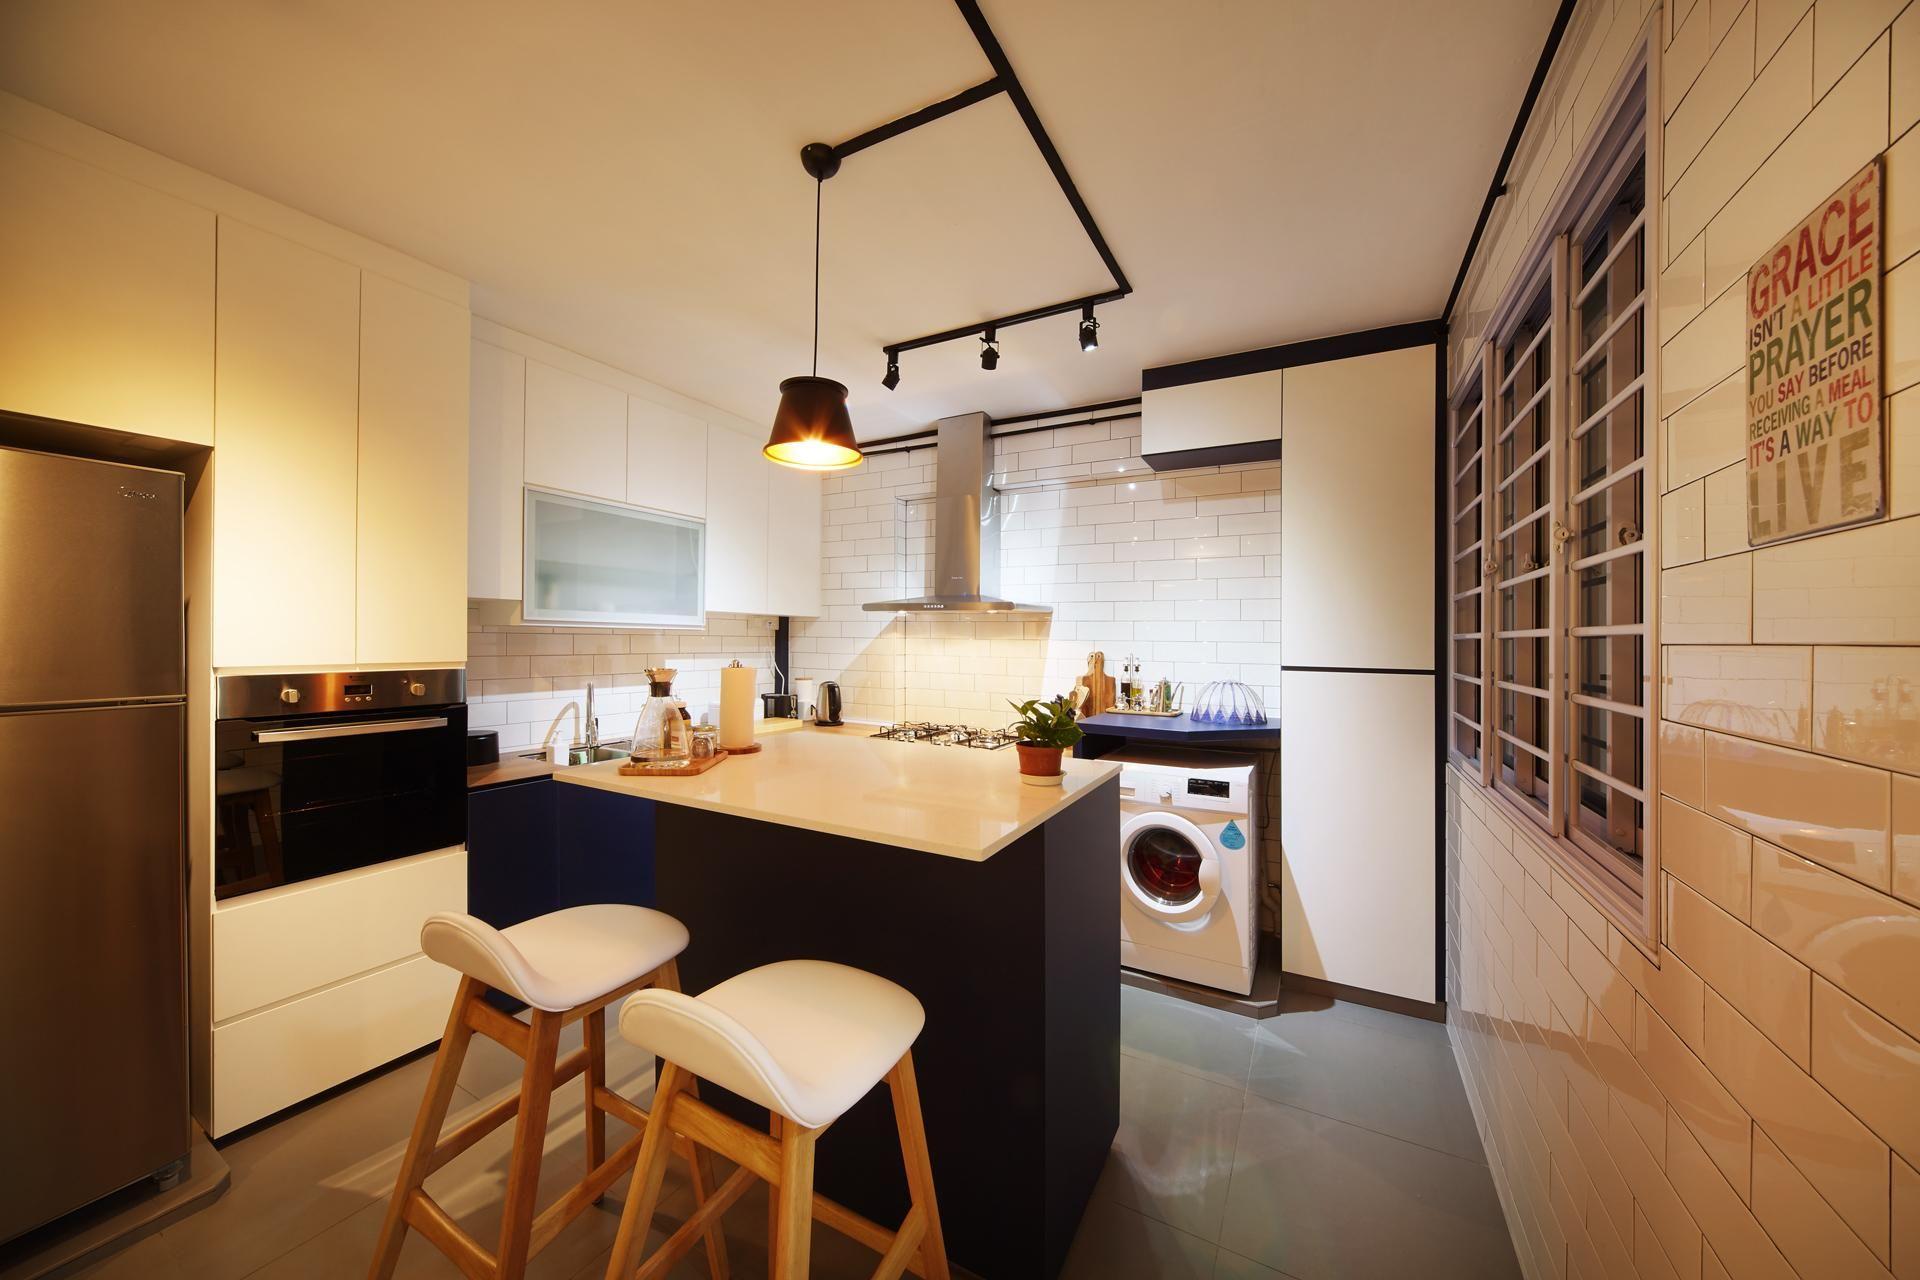 Interior designer wee studio location tampines hdb cost of renovation - Tampines Qanvast Home Design Renovation Remodelling Furnishing Ideas